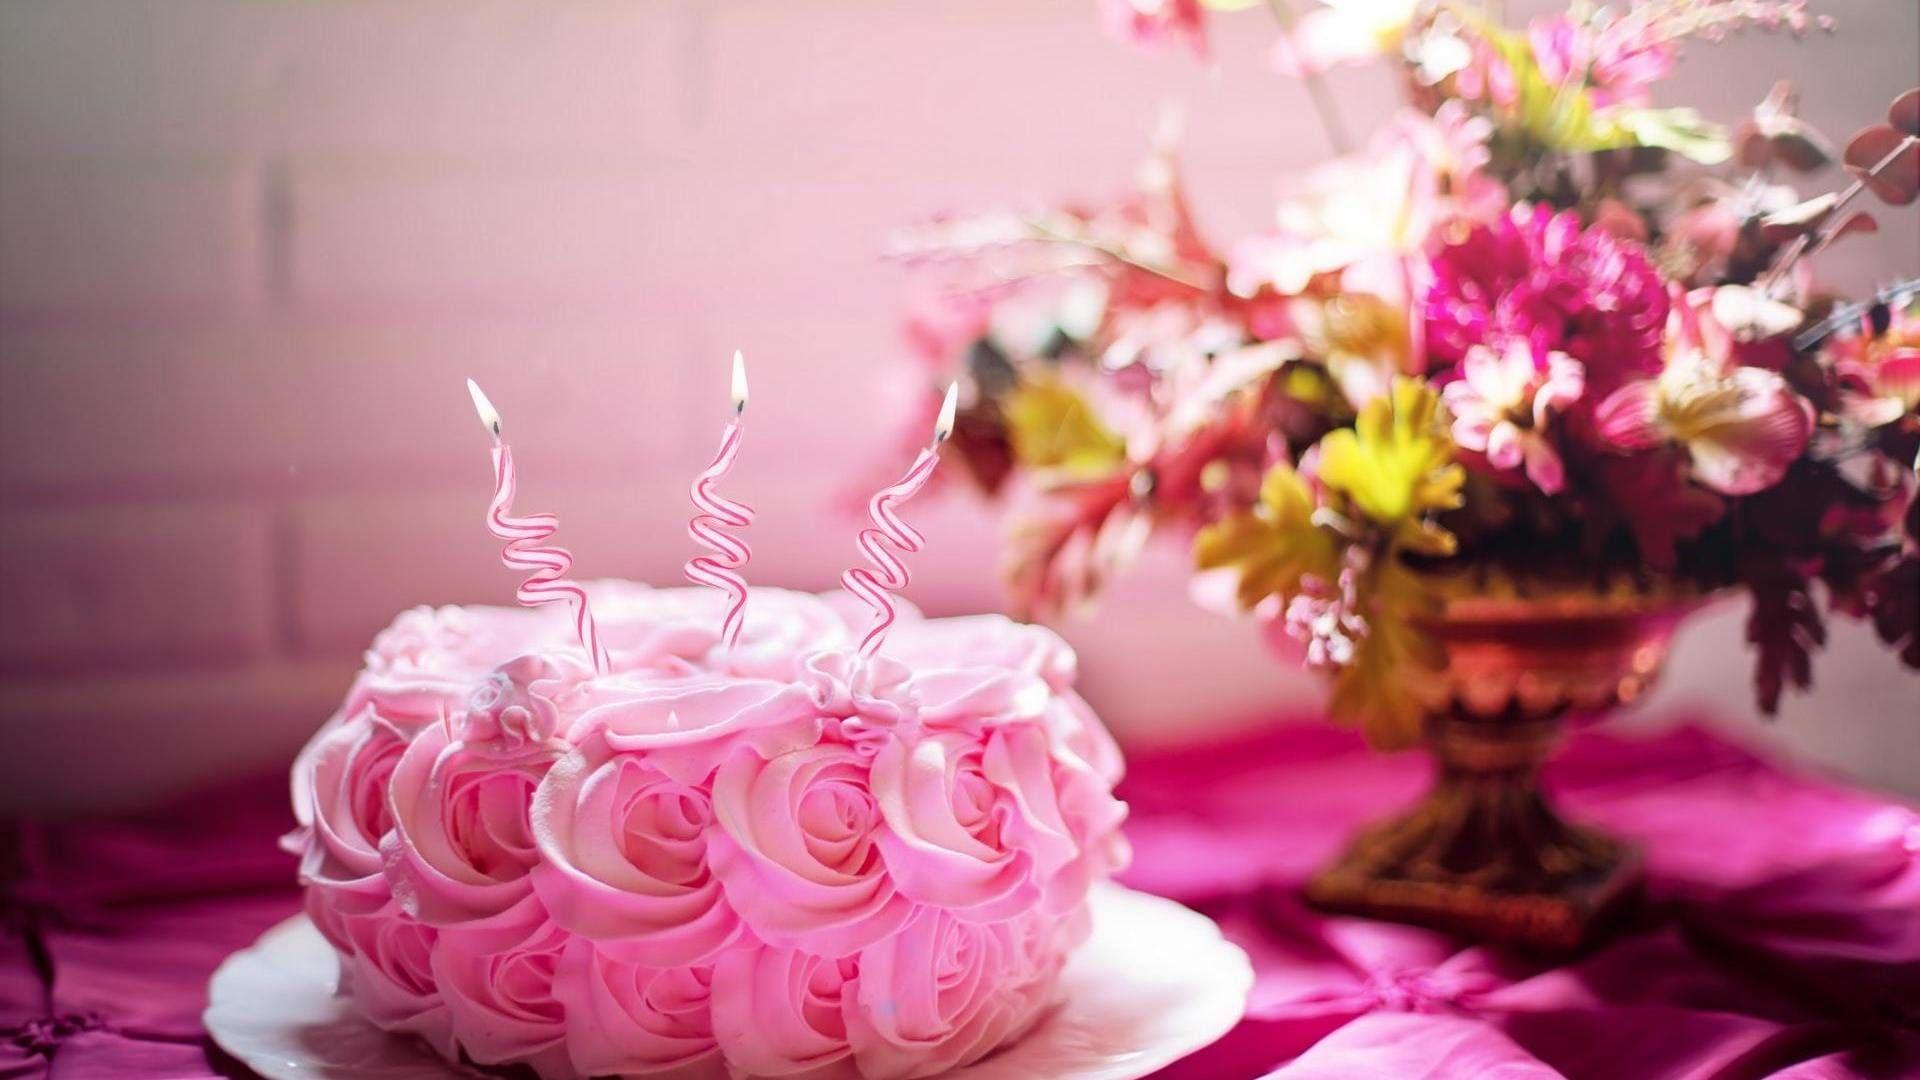 Birthday Cake Free Wallpaper